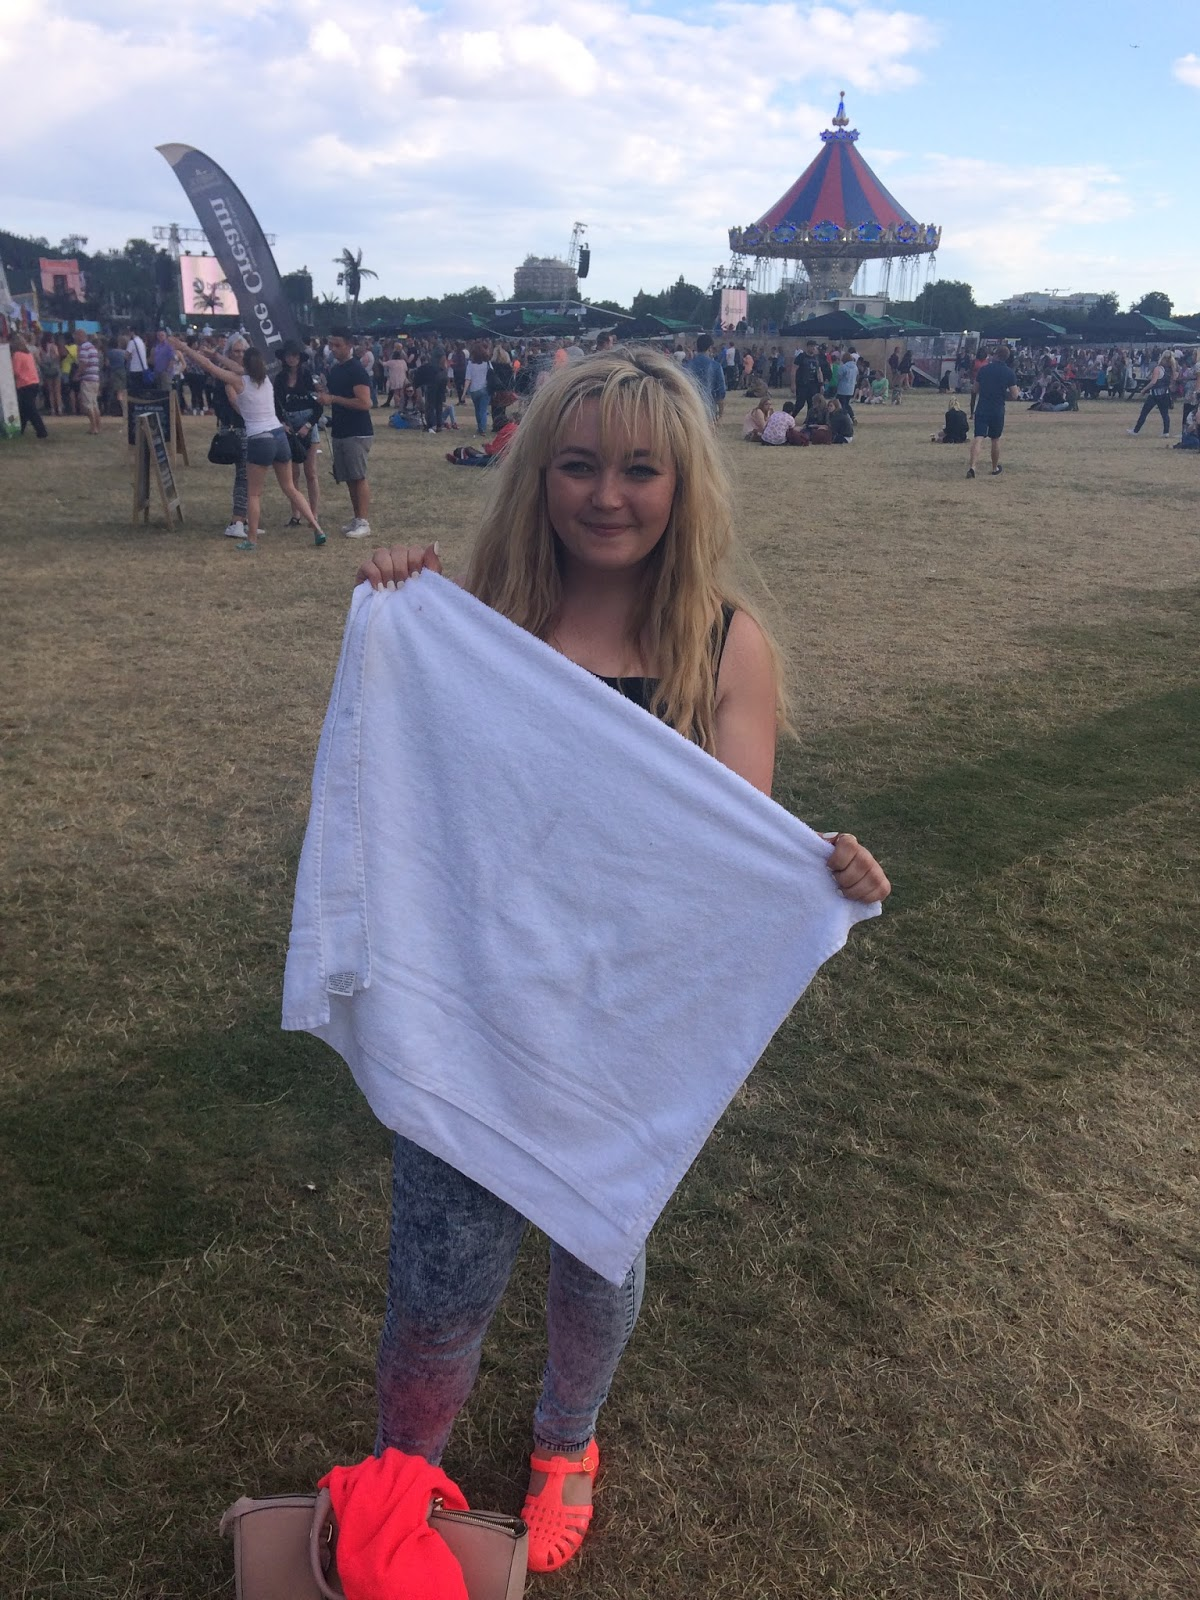 Nicola Simmons, something like nicola, rixton towel,